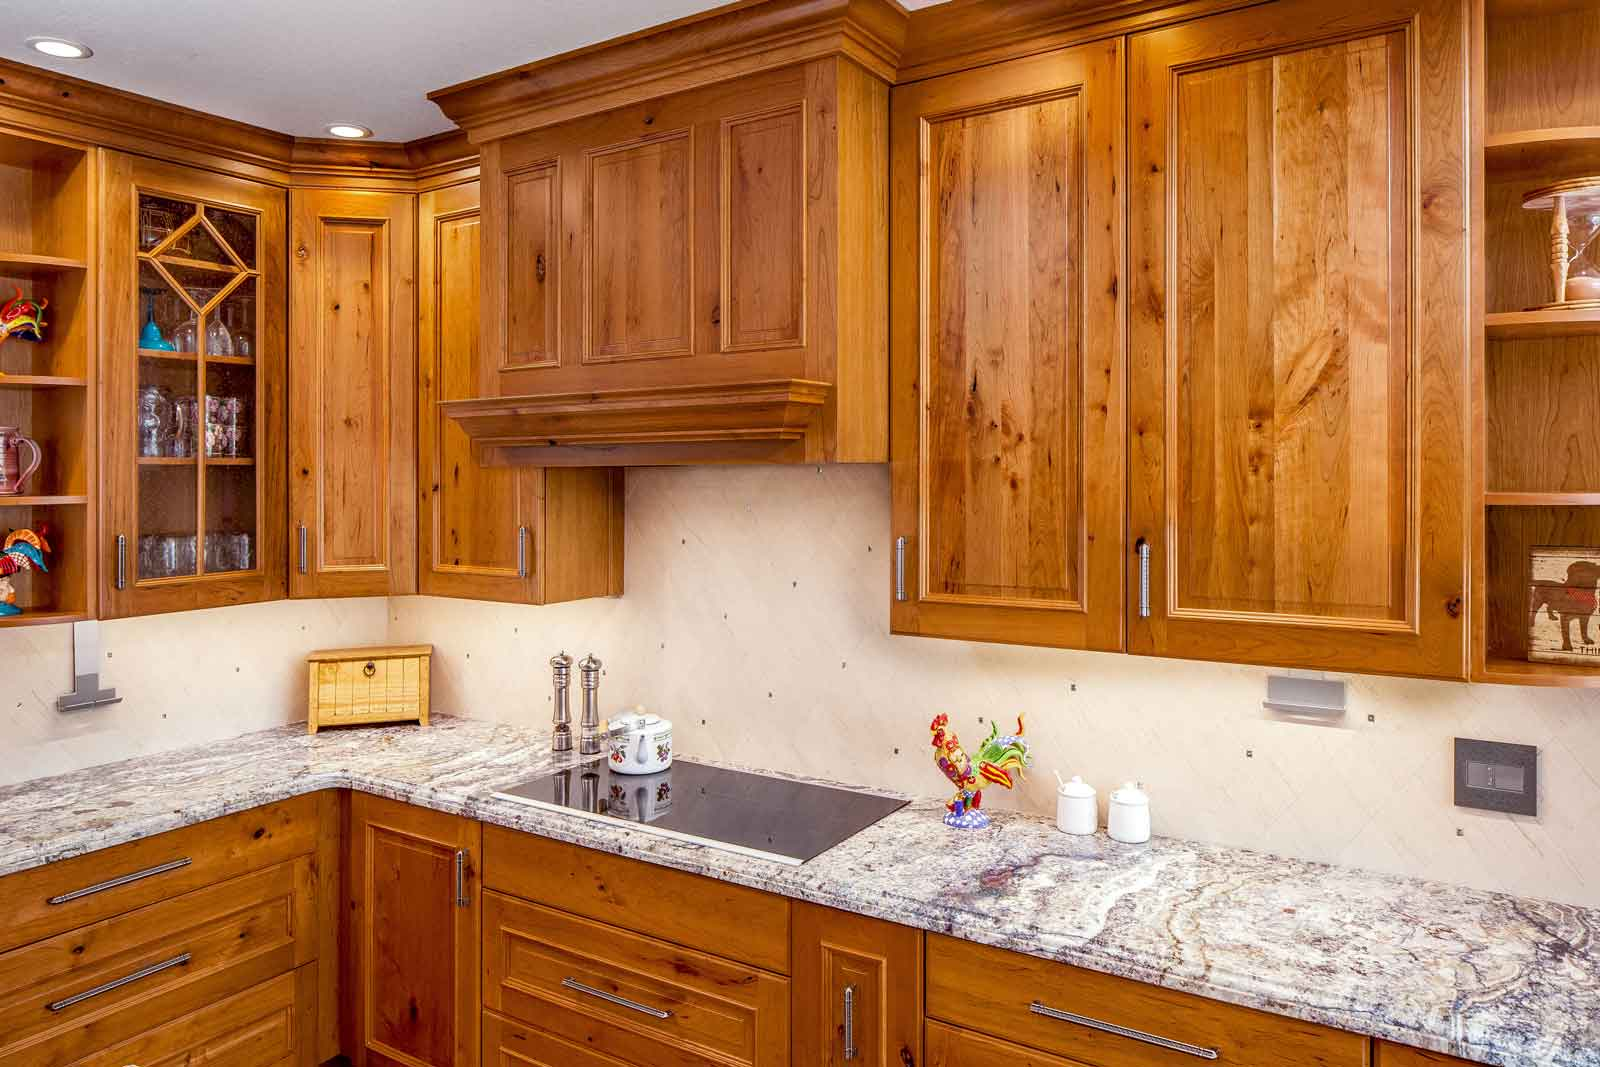 Cherry Cabinet Range Hood